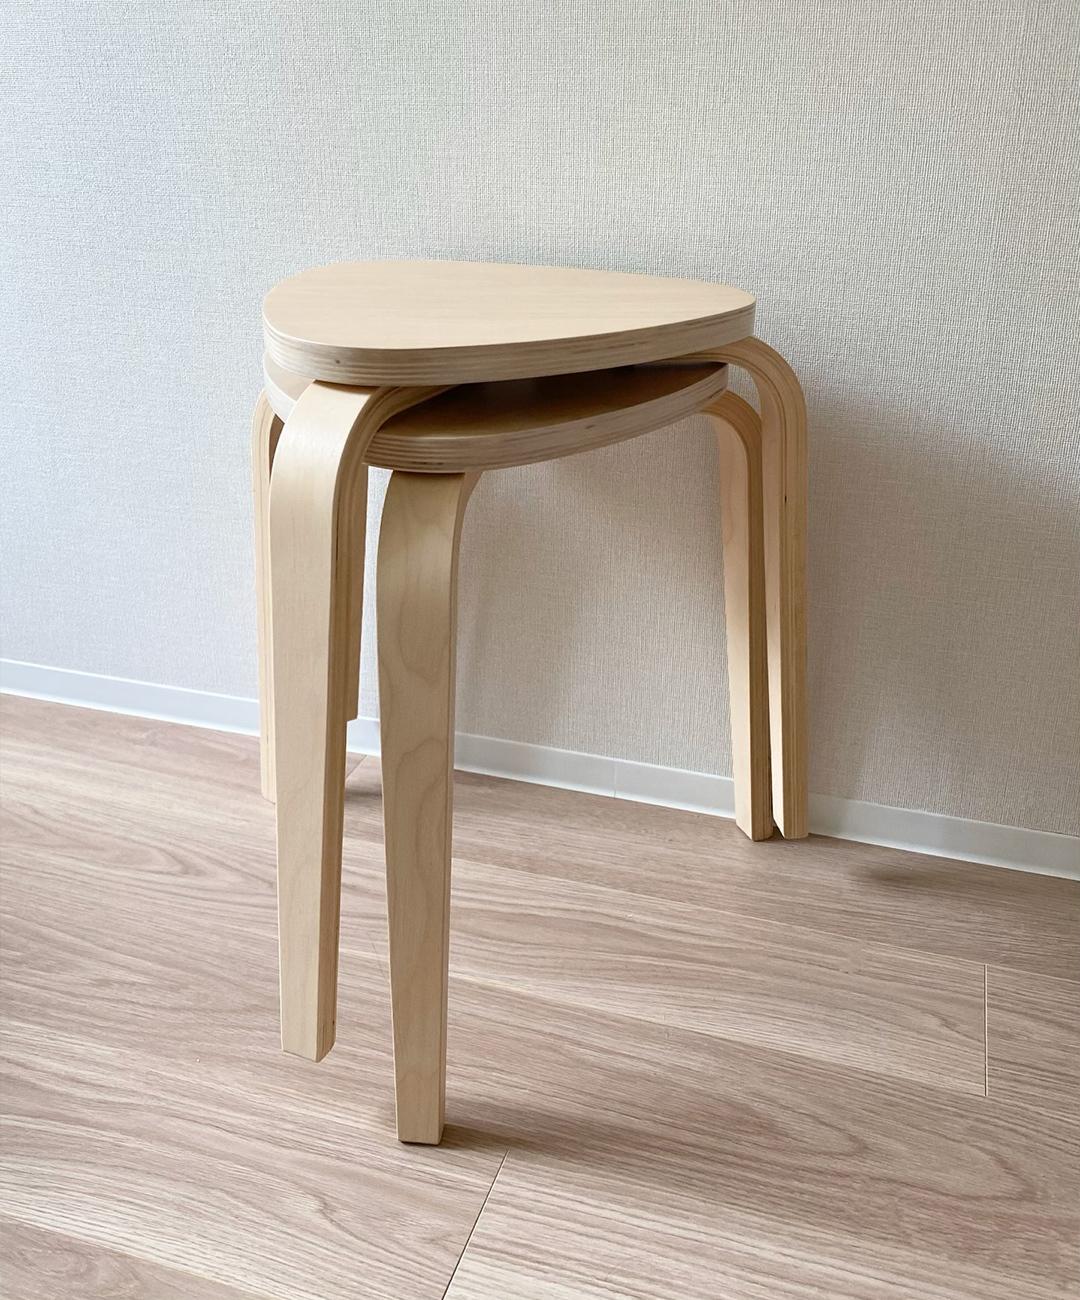 IKEAのインテリア名品をもっと見る_1_1